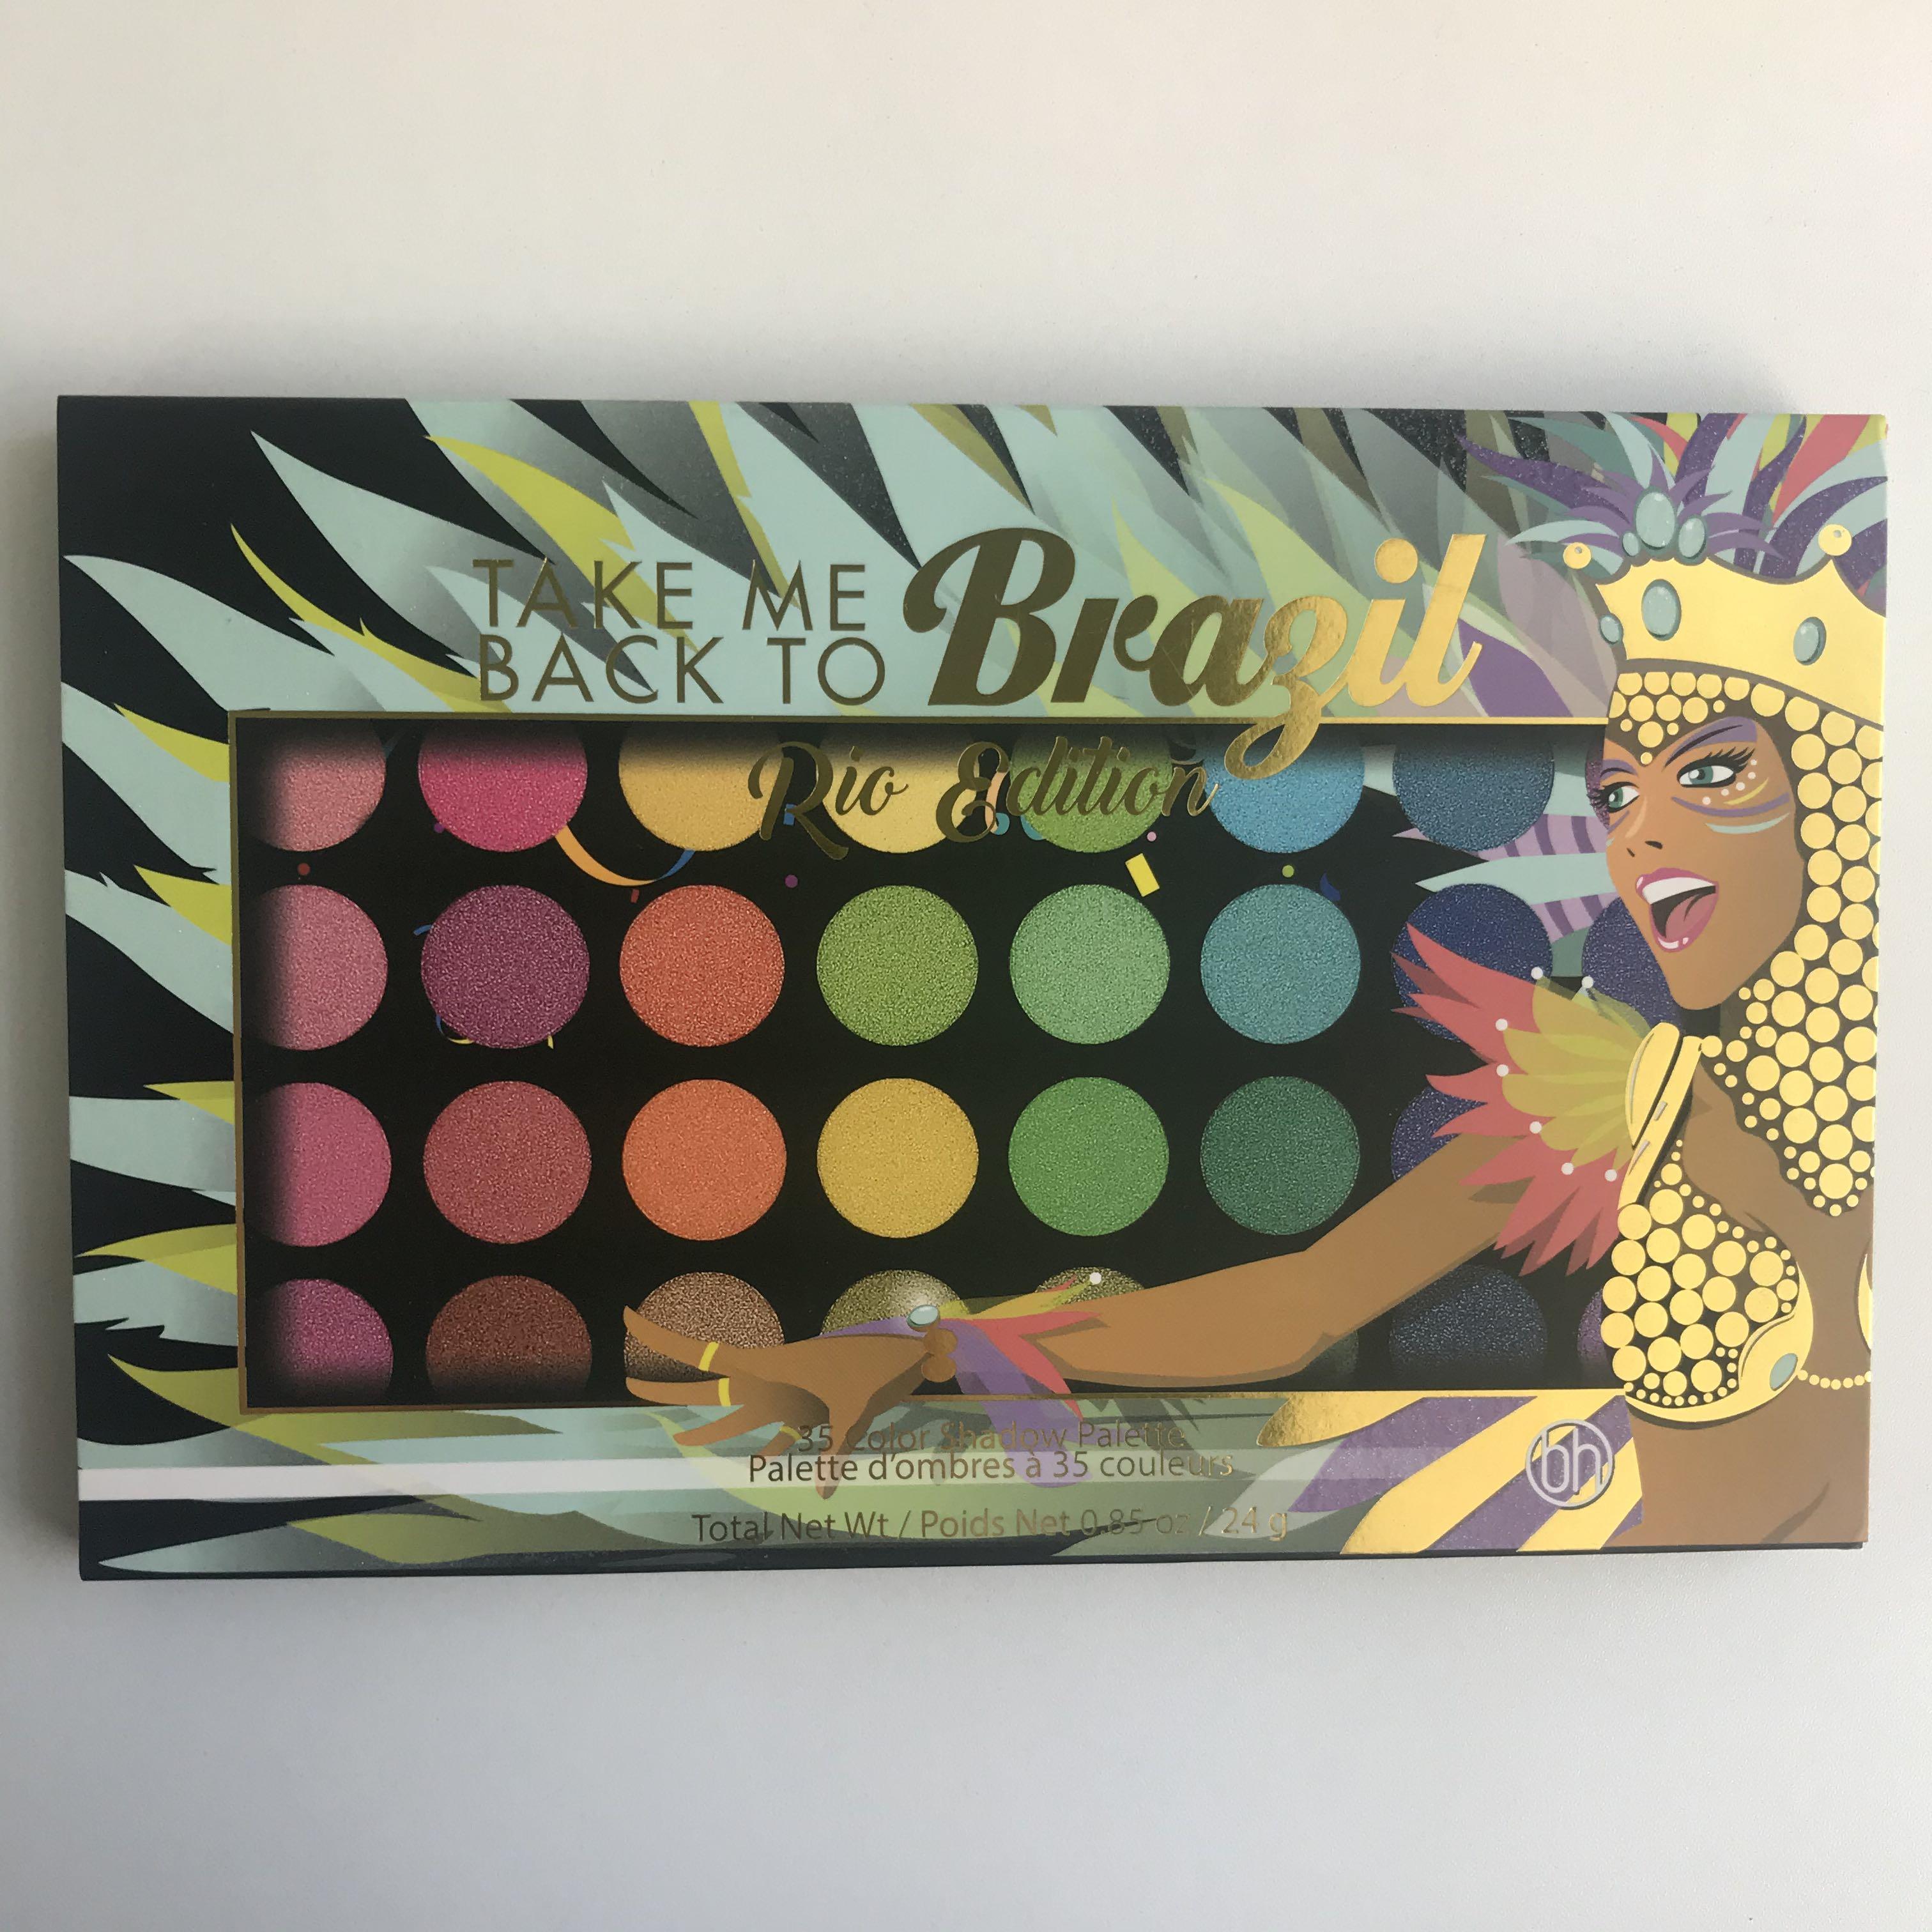 Take Me Back to Brazil (Rio edition) Bh Cosmetics eyeshadow palette